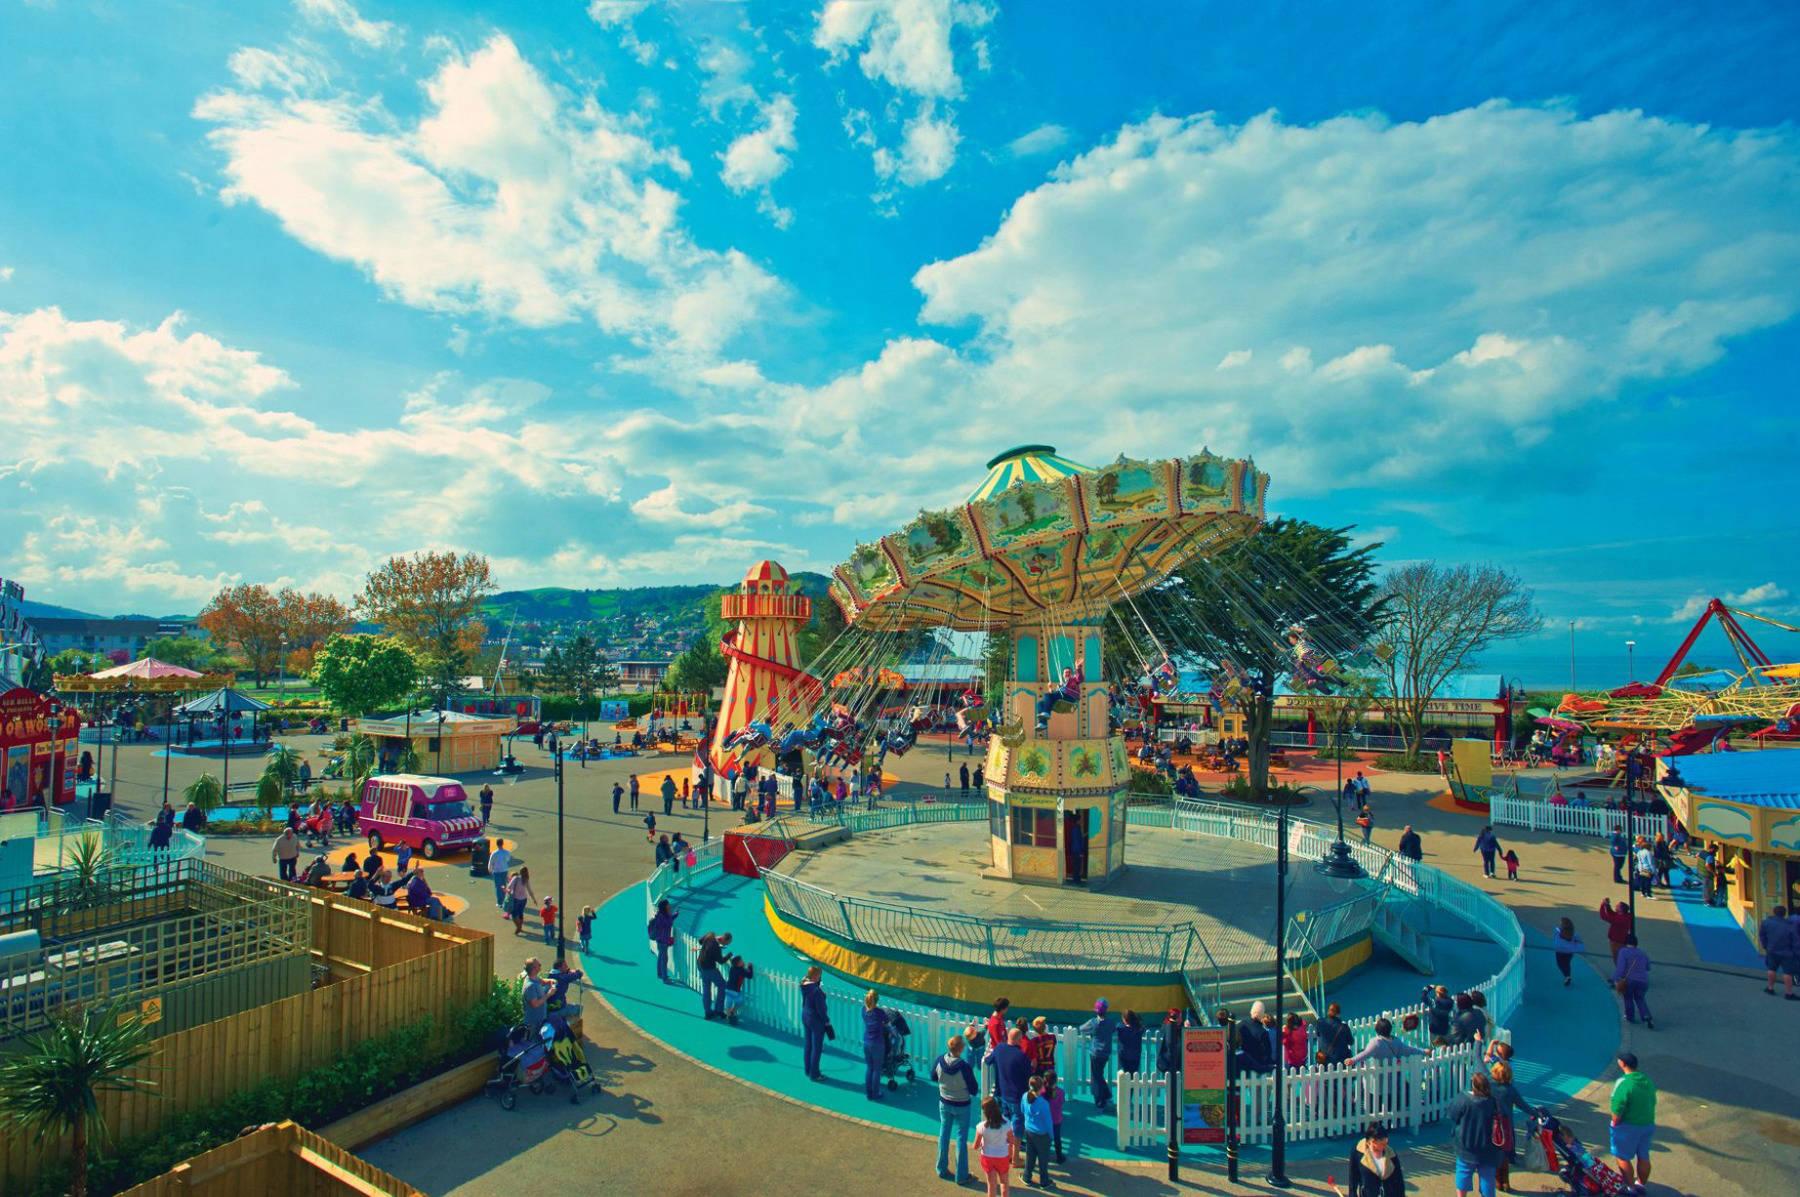 fairground in butlins minehead resort